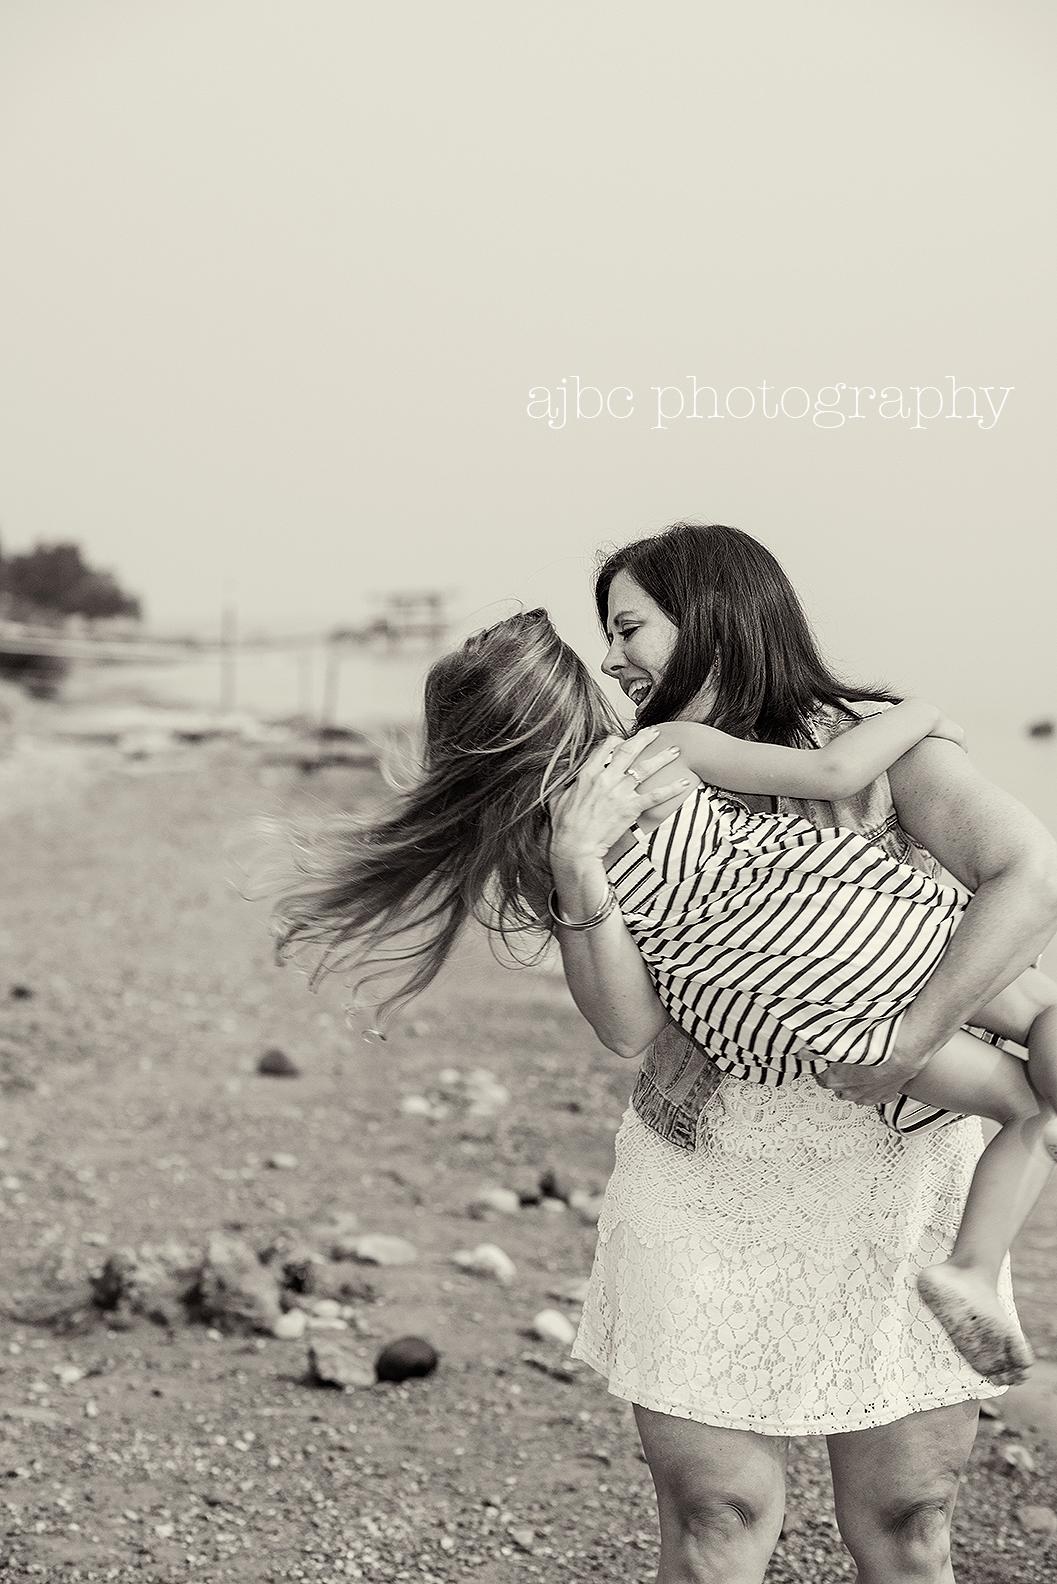 ajbcphotgraphy-port-huron-michigan-photographer-family-photographer-child-photographer-beach-outdoors.jpg